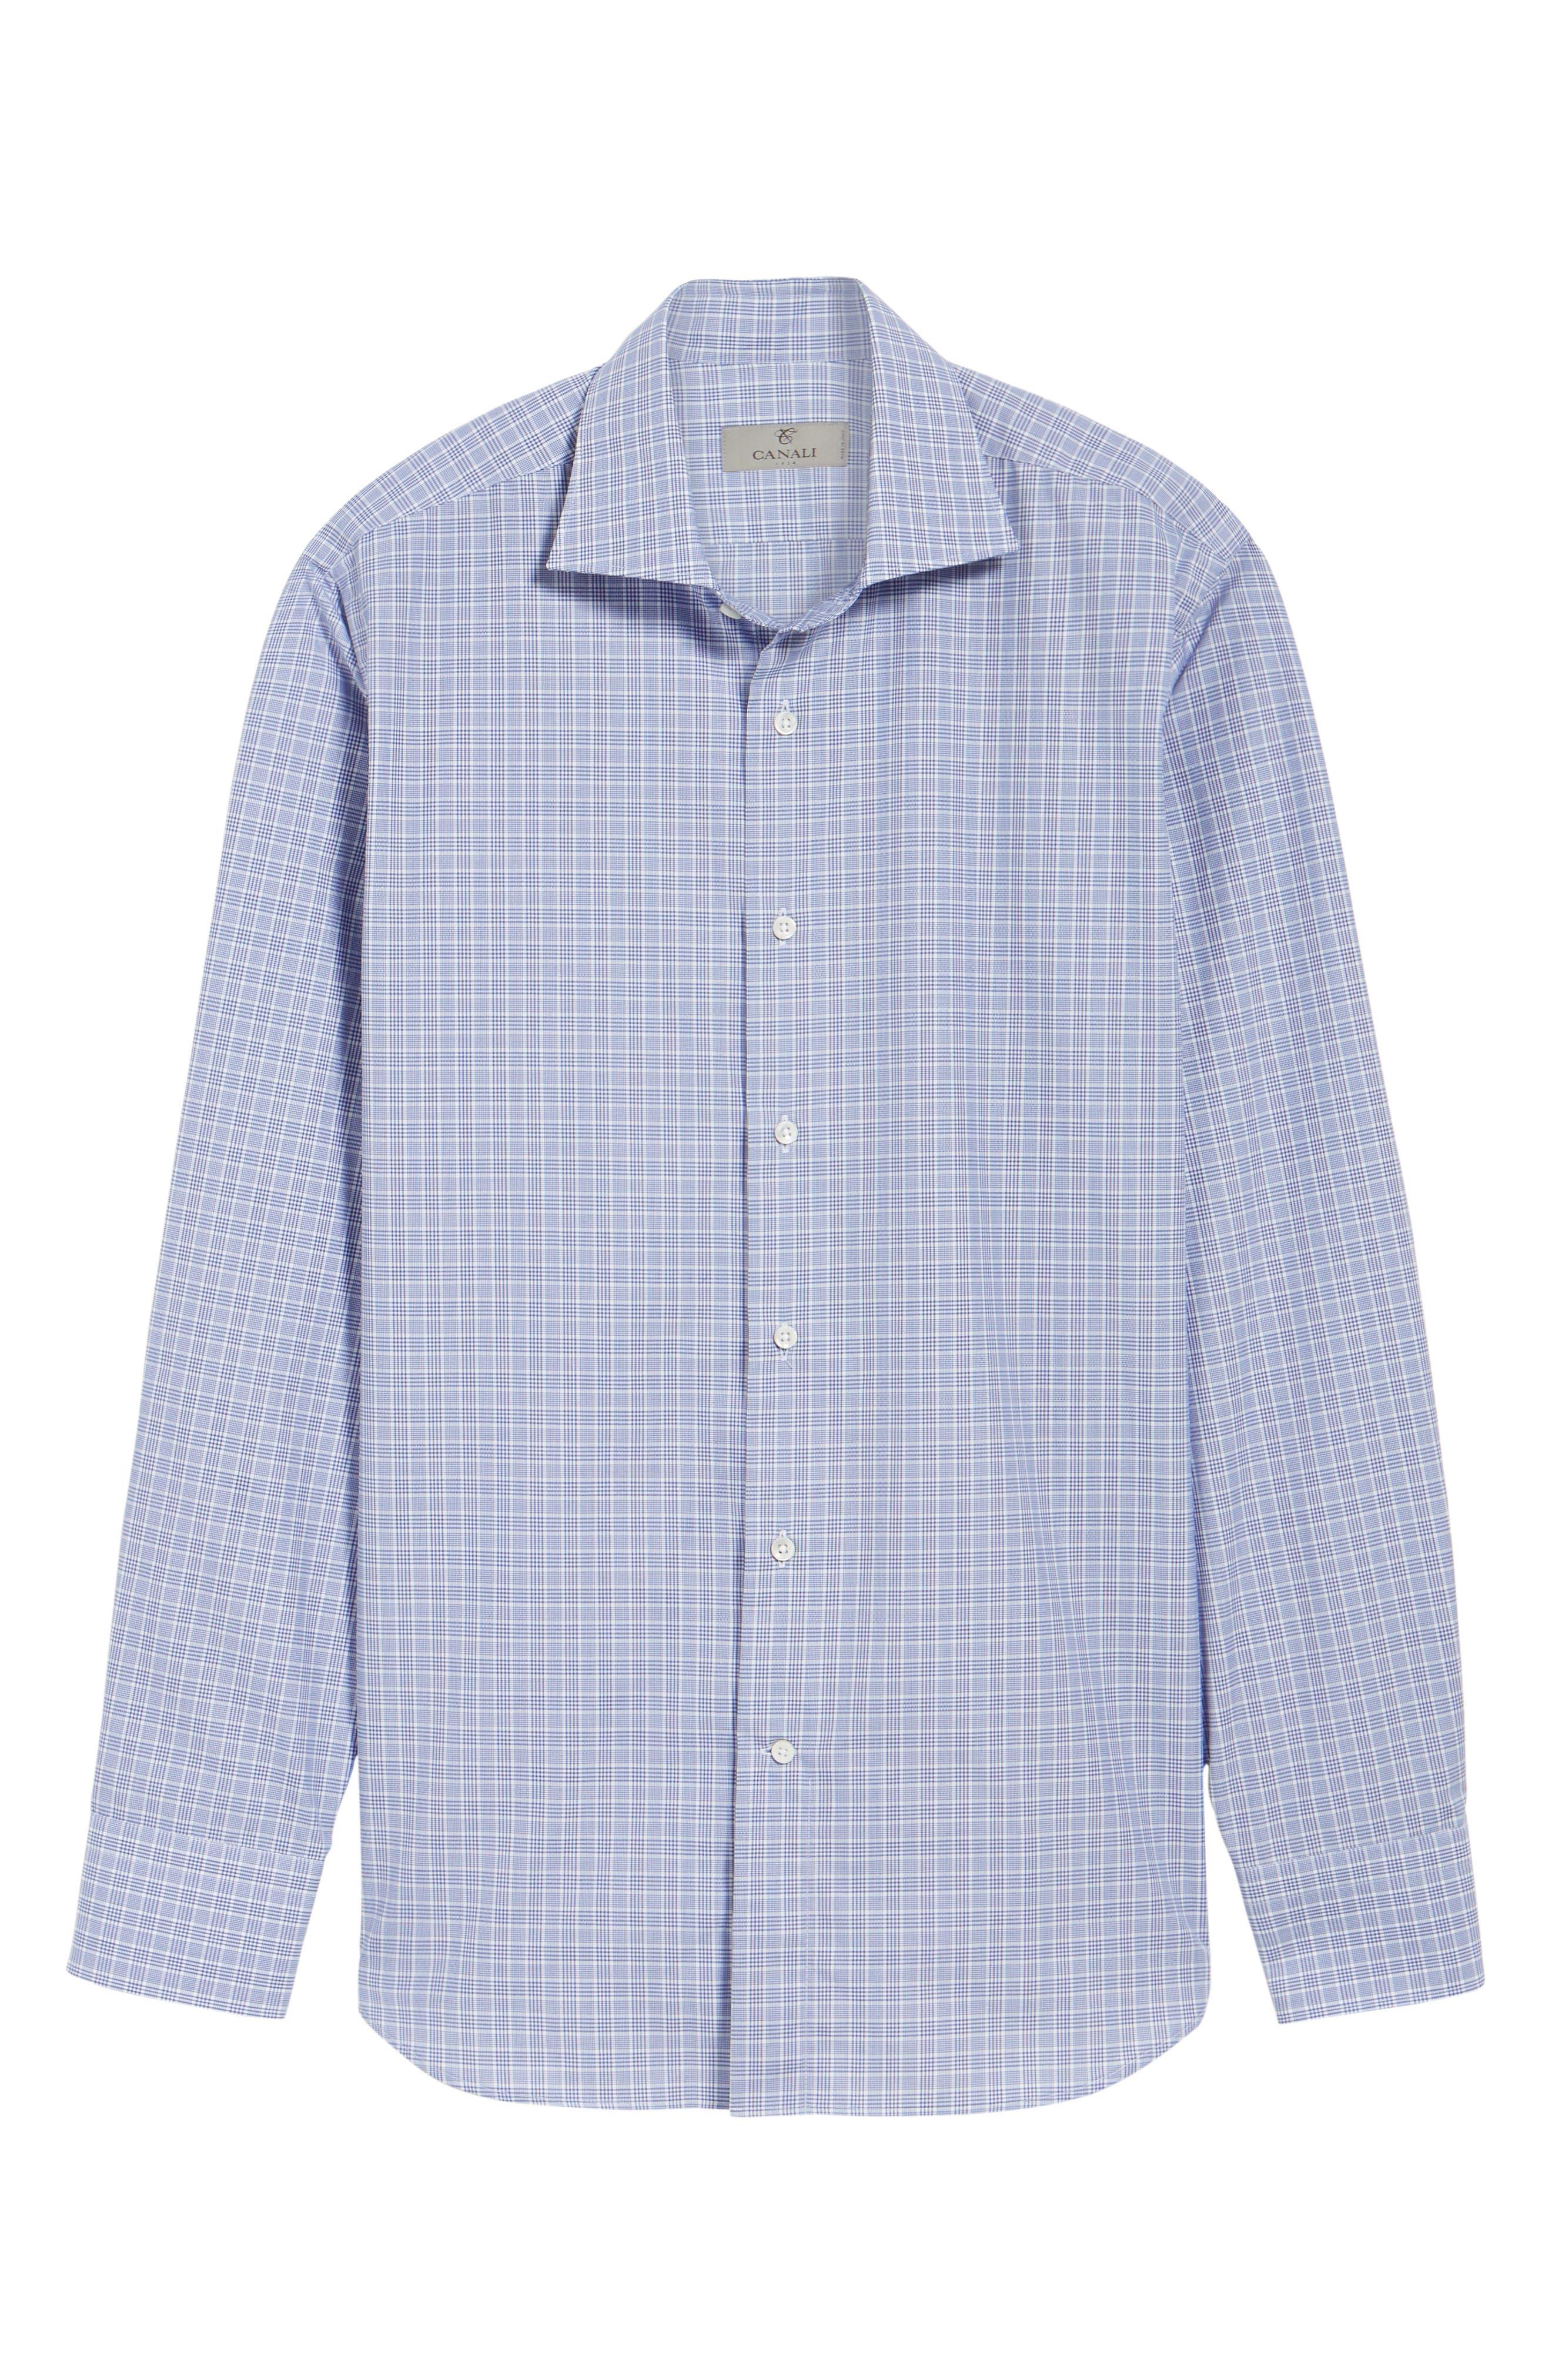 Regular Fit Plaid Dress Shirt,                             Alternate thumbnail 3, color,                             450